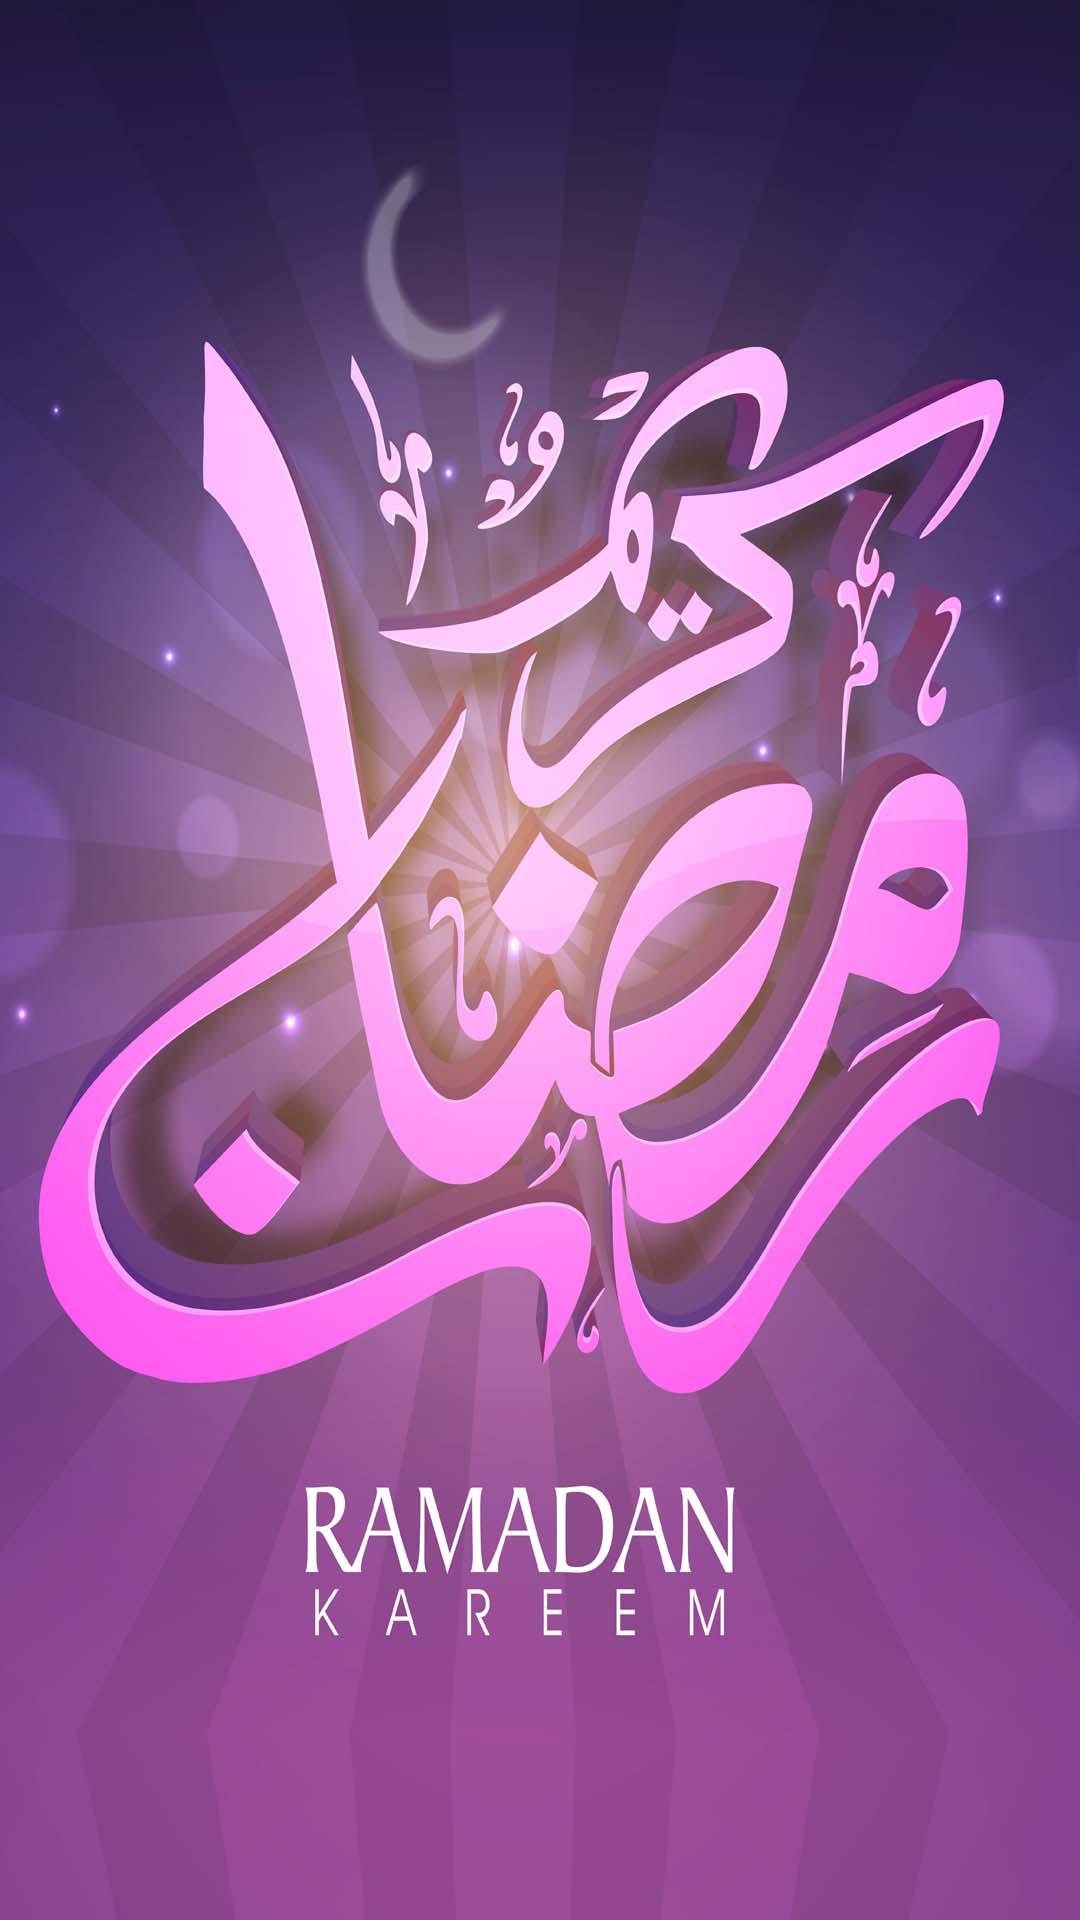 خلفيات موبايل رمضان كريم Mobile Wallpapers HD 12 خلفيات موبايل رمضان كريم Mobile Wallpapers HD